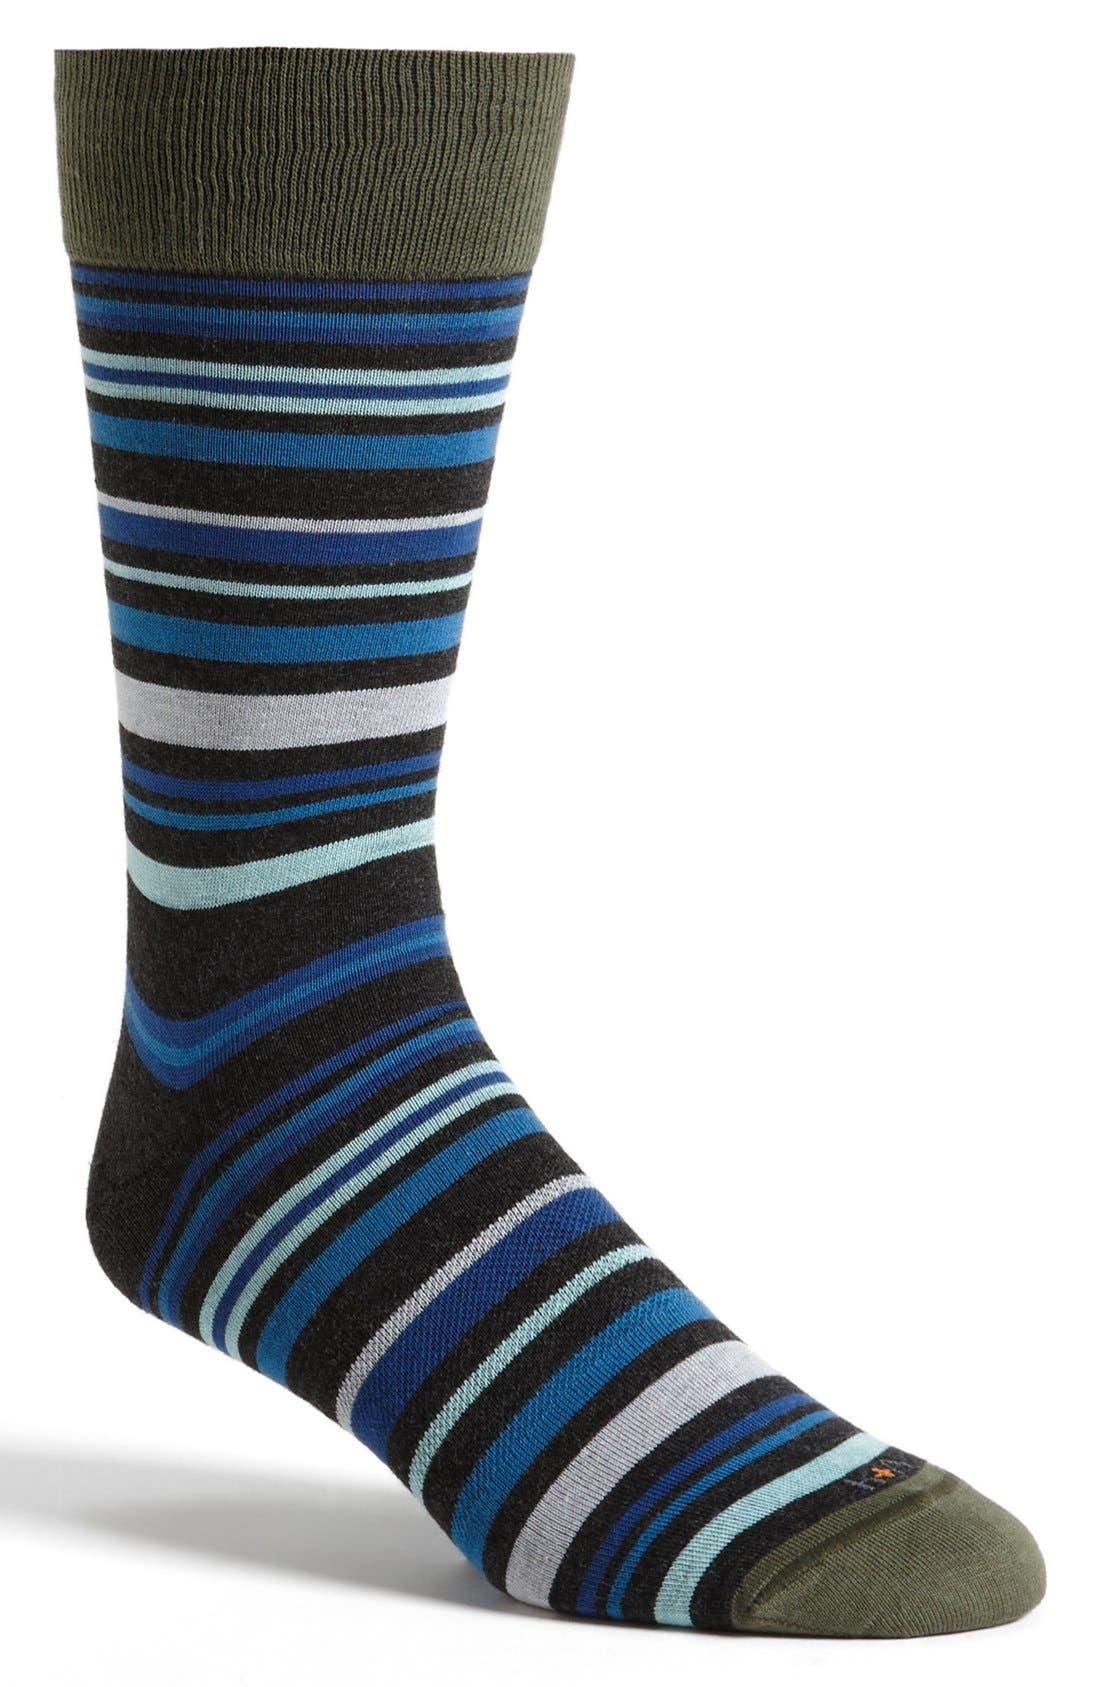 Main Image - hook + ALBERT 'Stratum' Socks